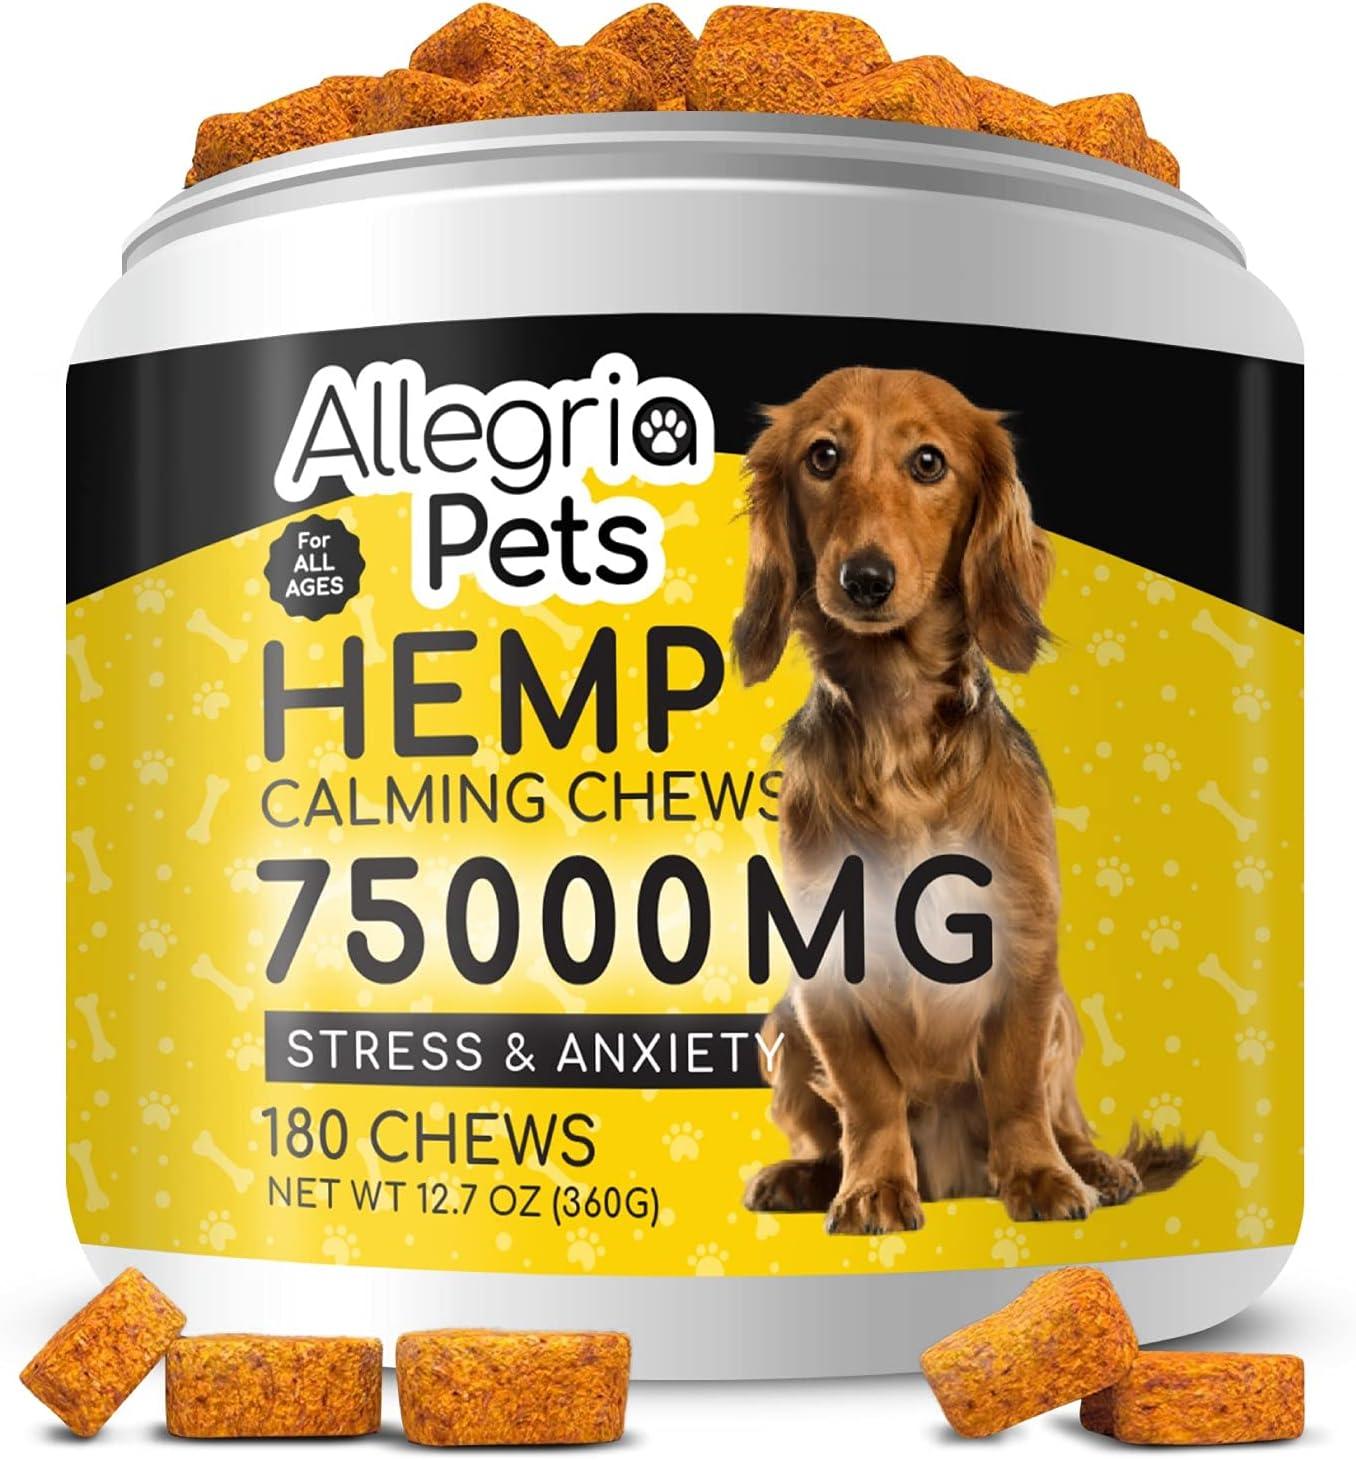 Hemp Calming Treats For Dogs Chews - 180 Dog Chews [Mega Value] - Dog Anxiety Relief - Dog Calming Treats With Valerian Root, Chamomile, L Tryptophan & Melatonin For Dogs Anxiety Sleep Aid USA Made